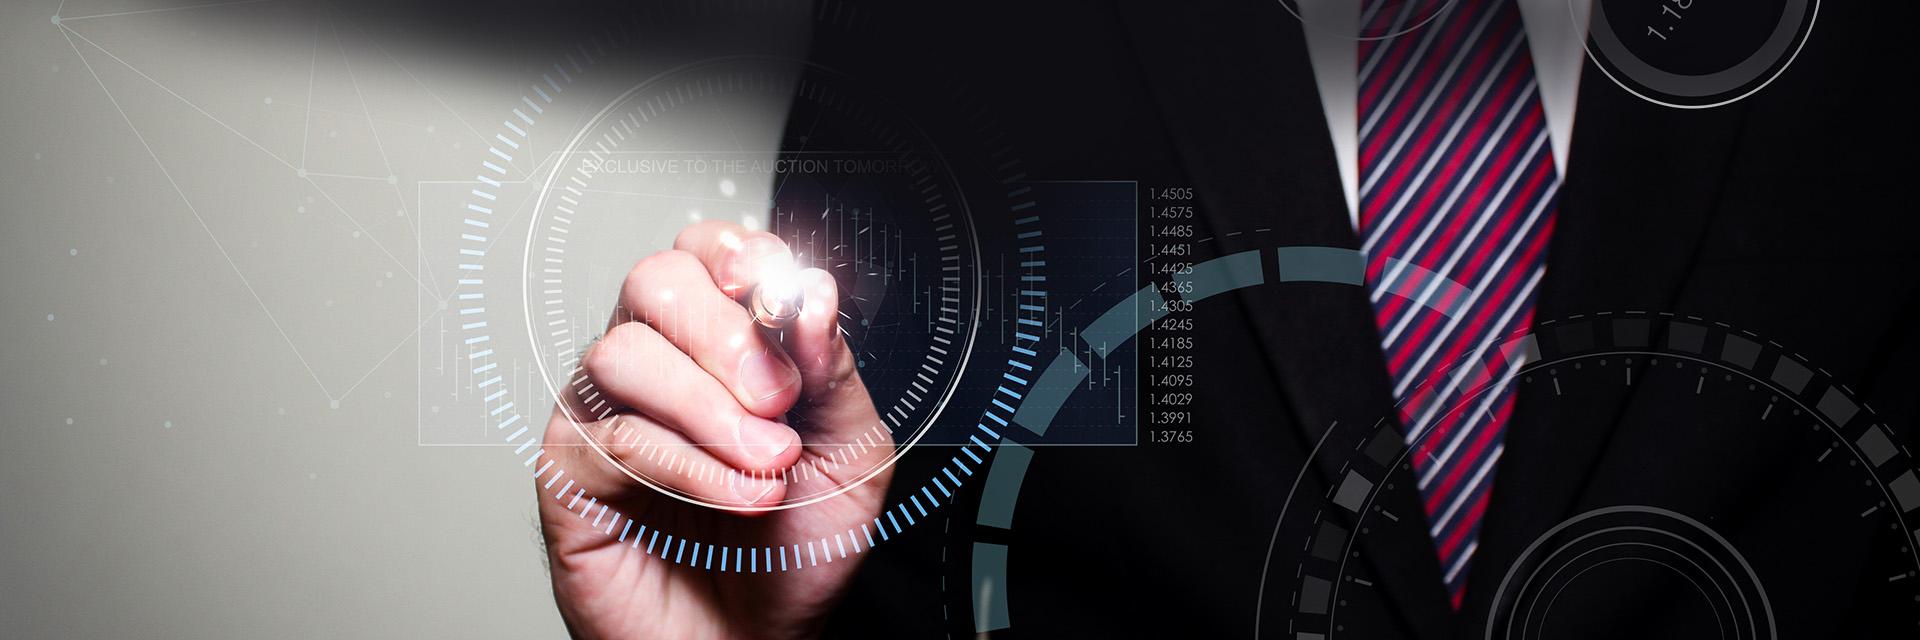 GRI-smart智能光控隔热膜